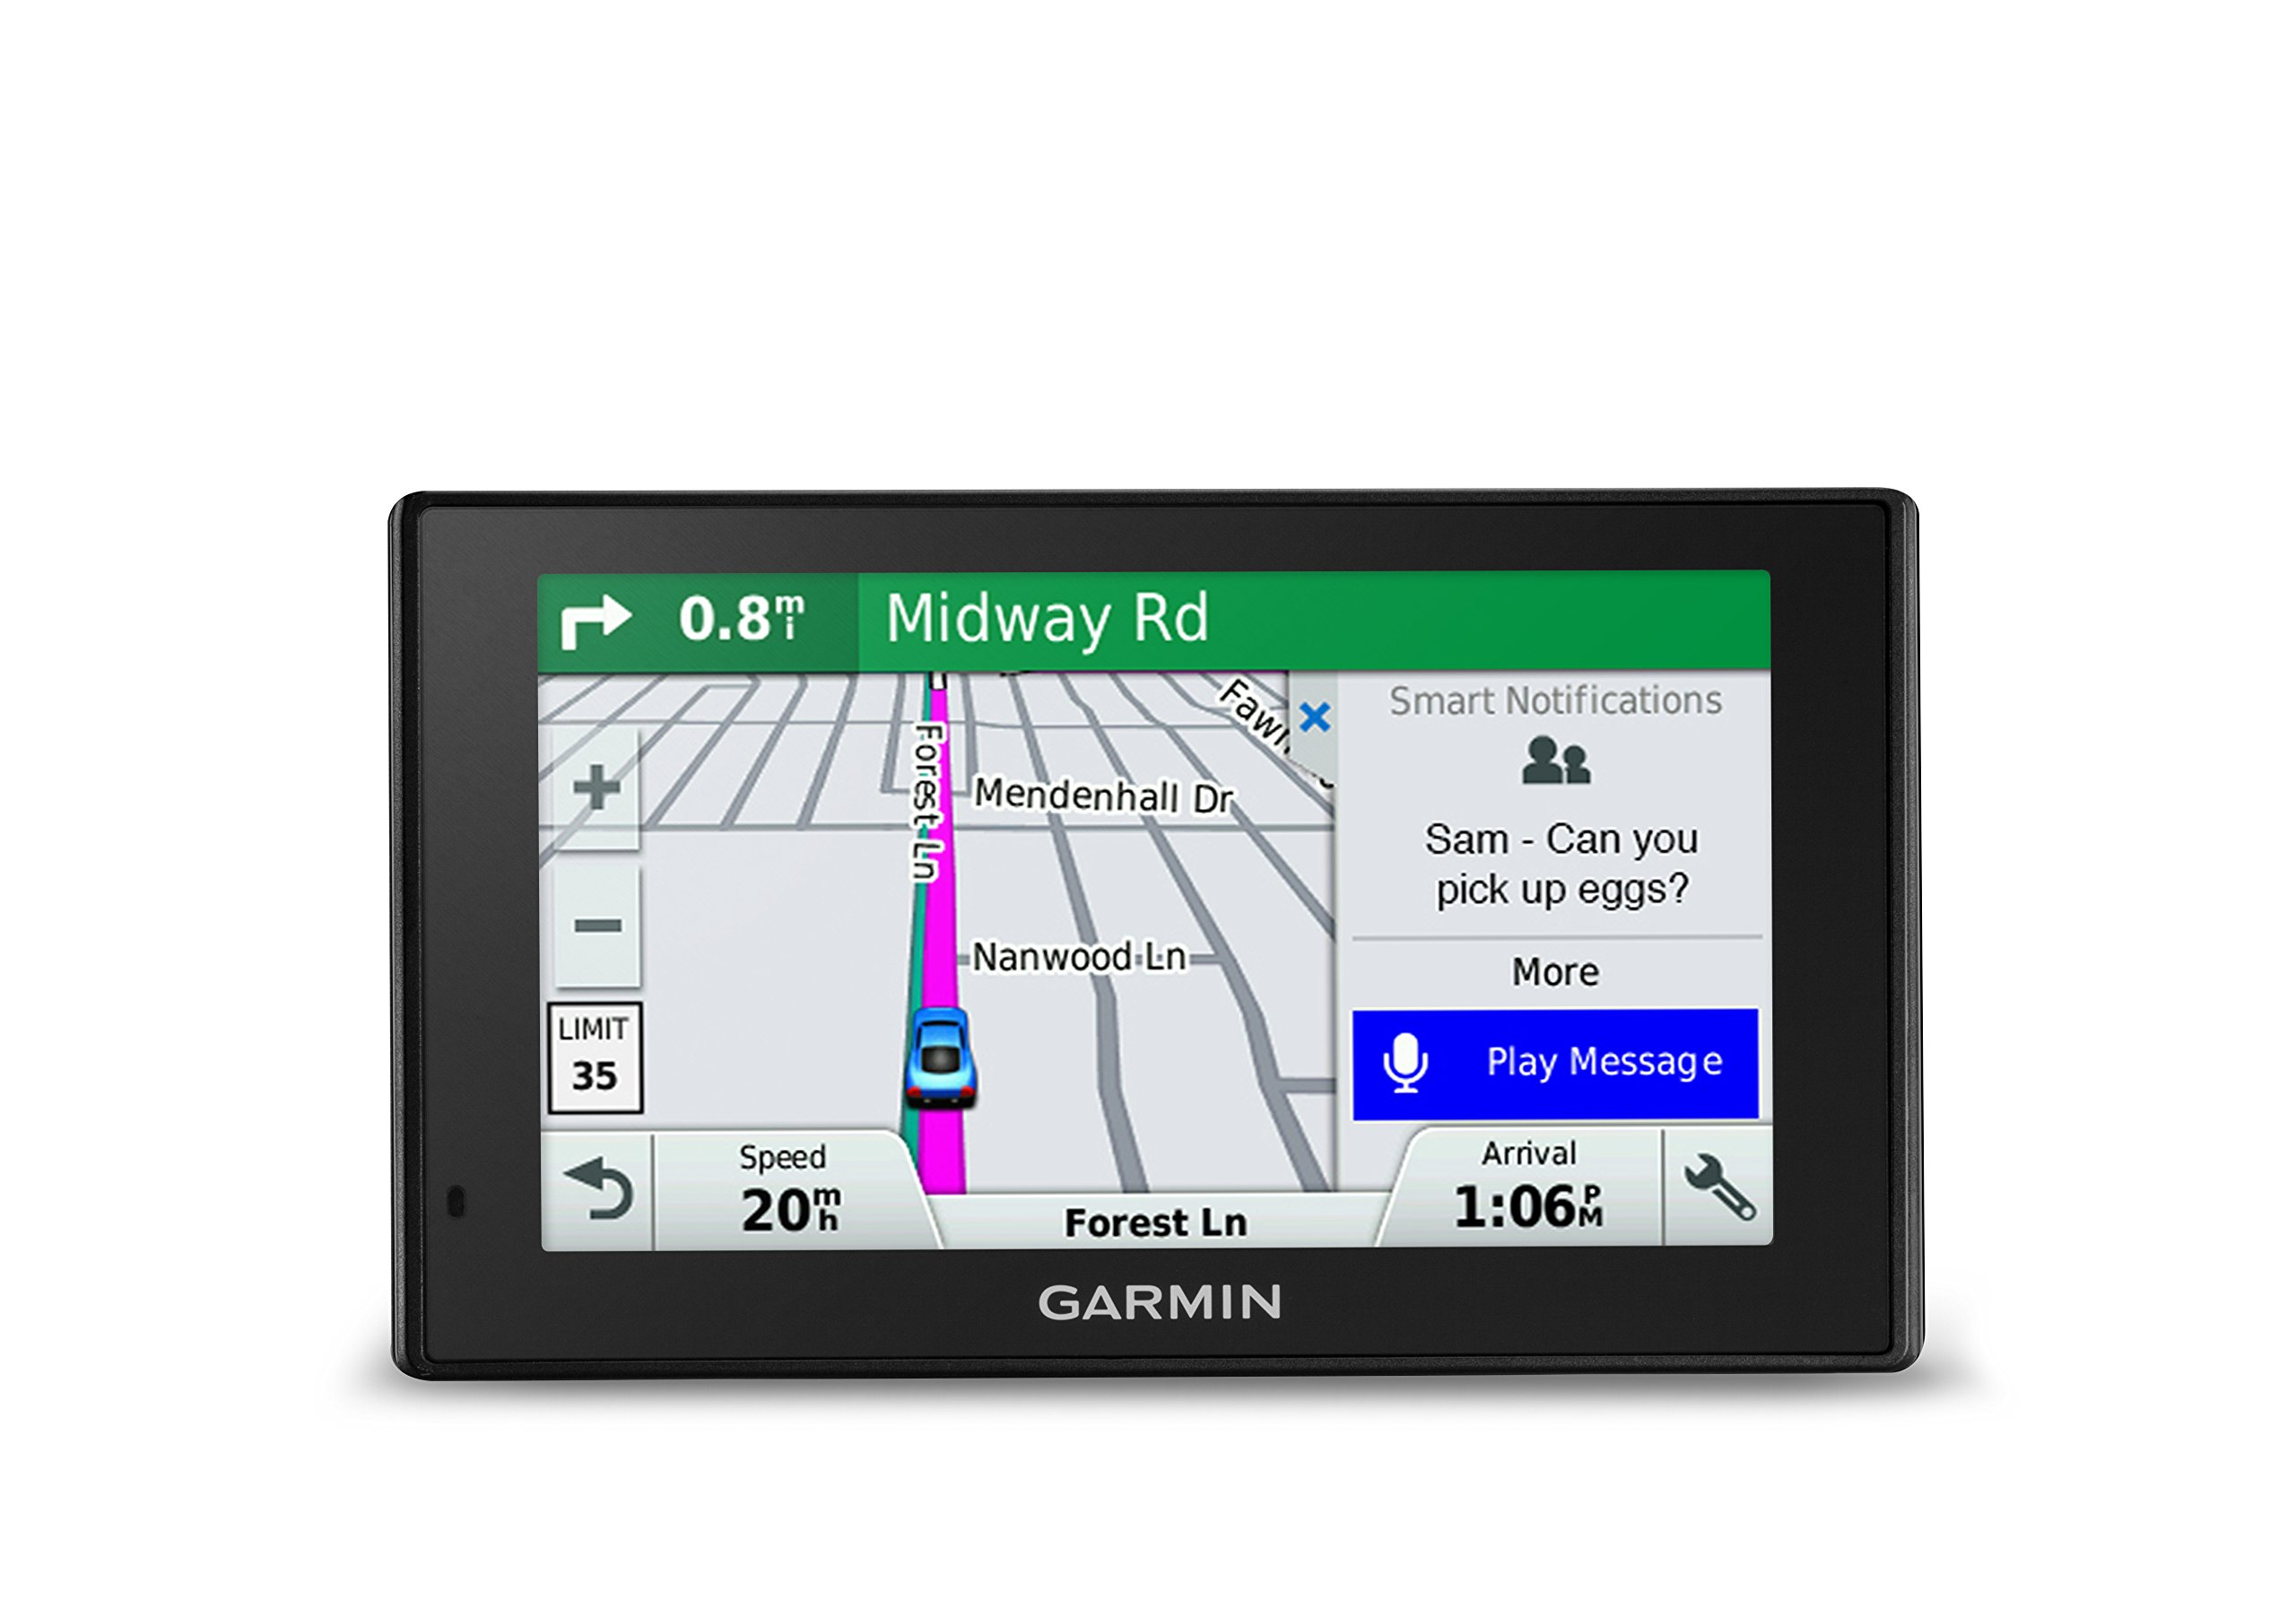 Garmin DriveSmart 51 NA LMT-S with Lifetime Maps/Traffic, Live Parking, Bluetooth,WiFi, Smart Notifications, Voice Activation, Driver Alerts, TripAdvisor, Foursquare by Garmin